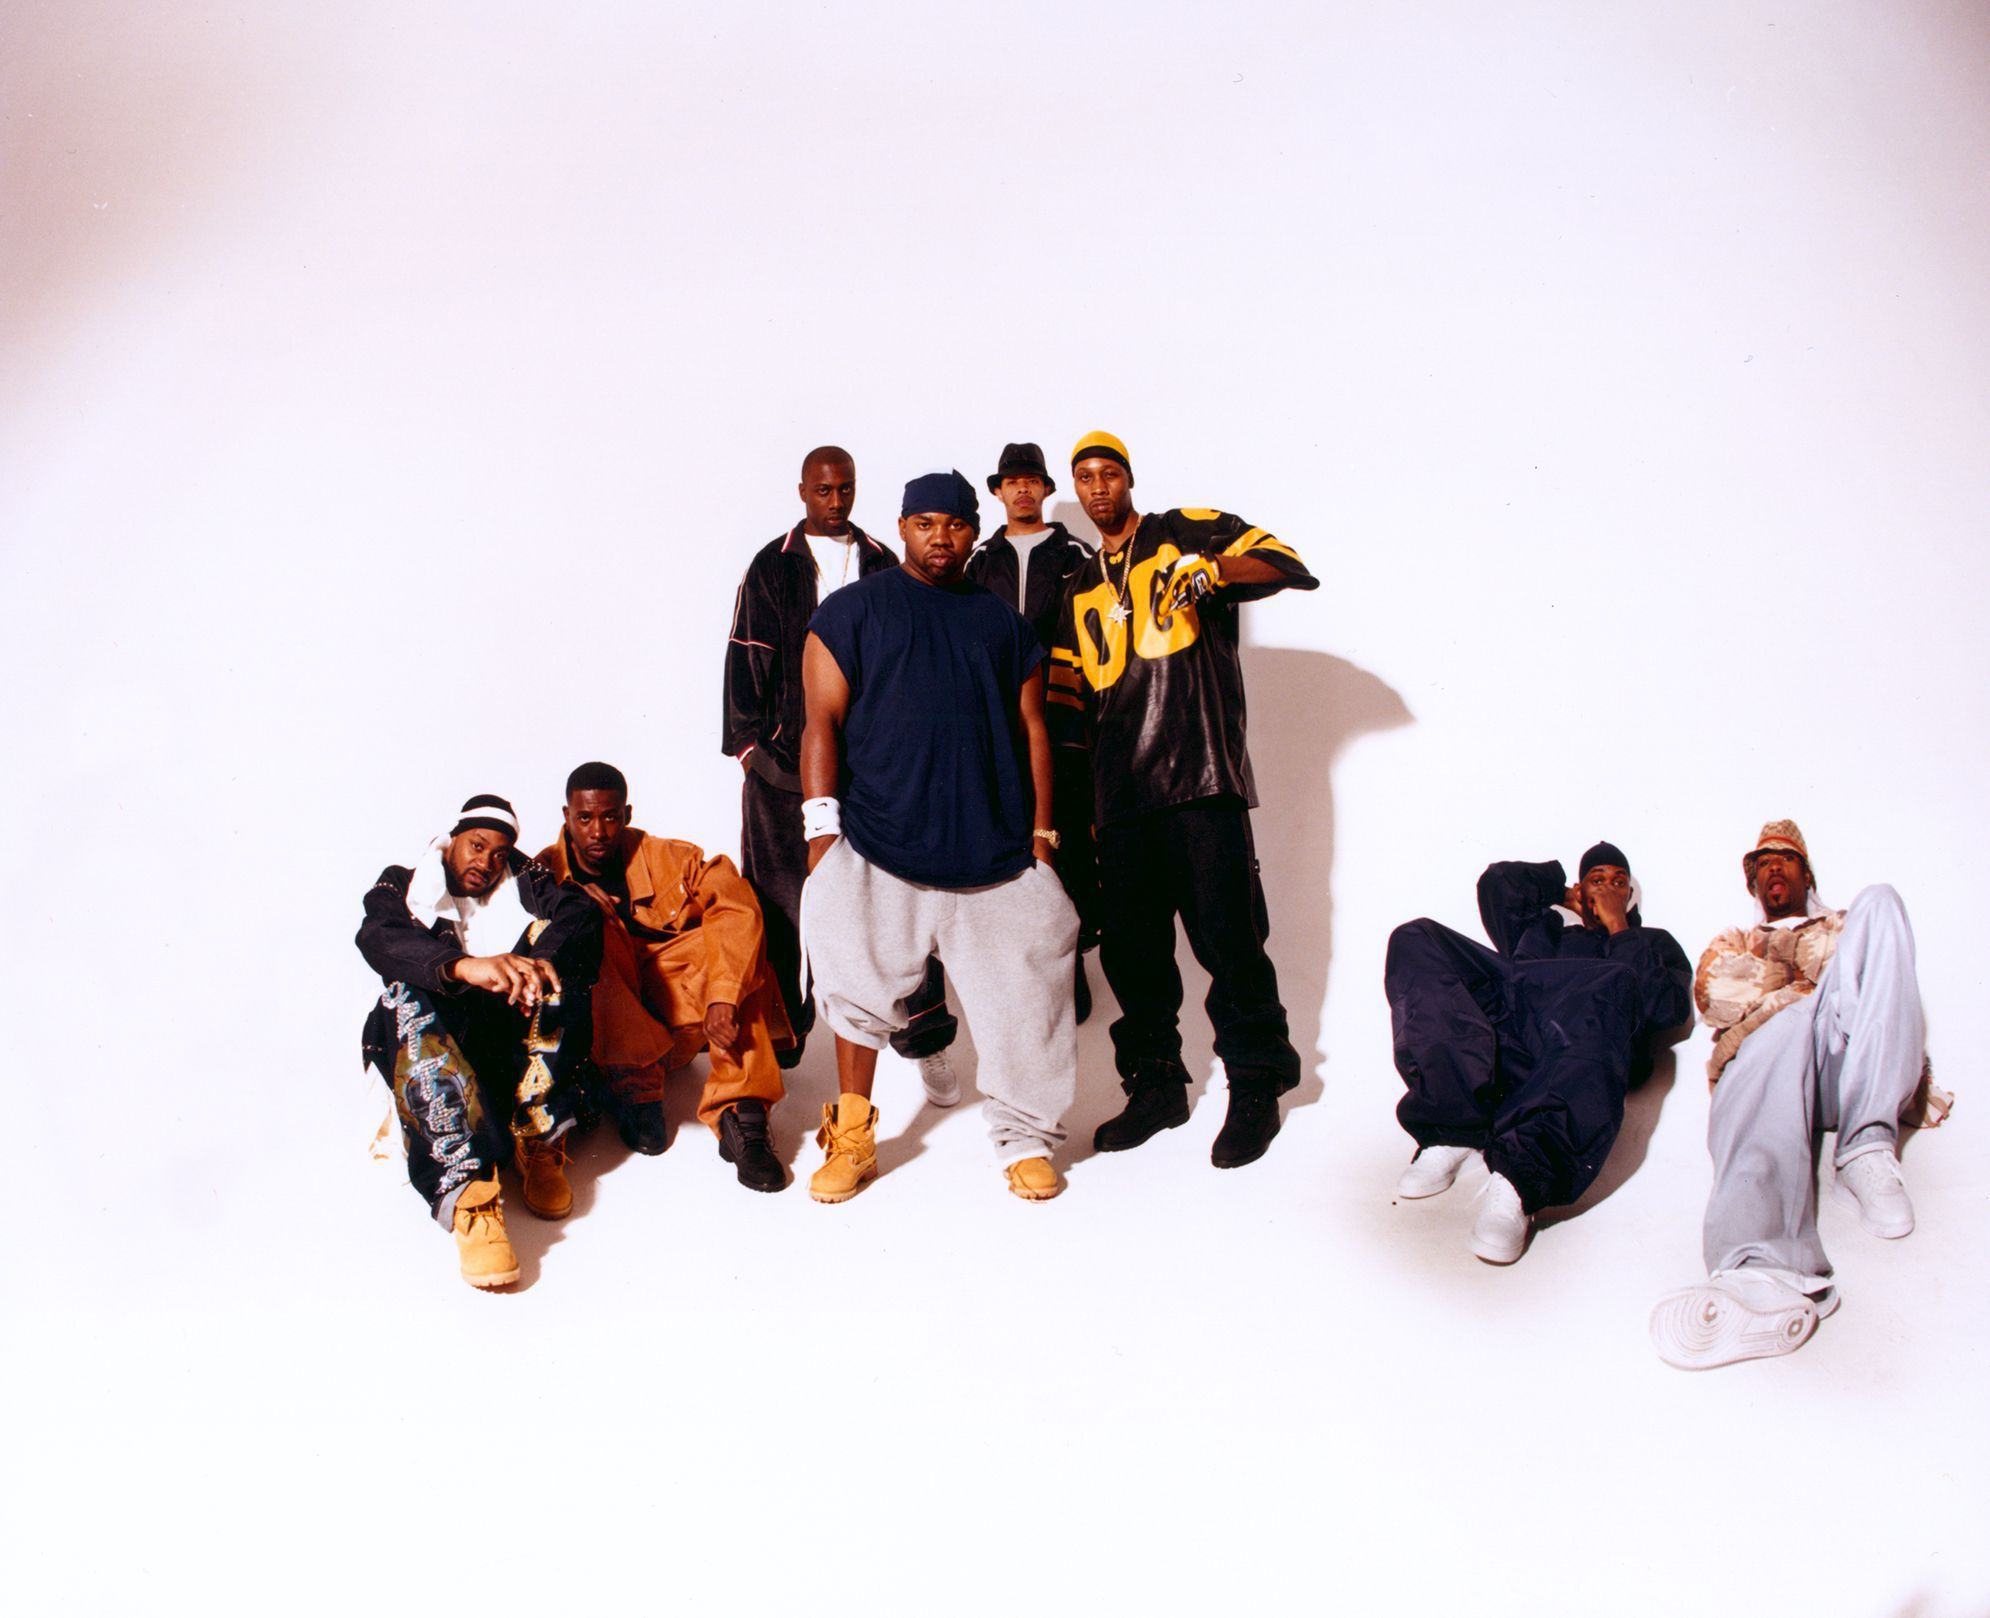 Wu Tang Clan Hd Background